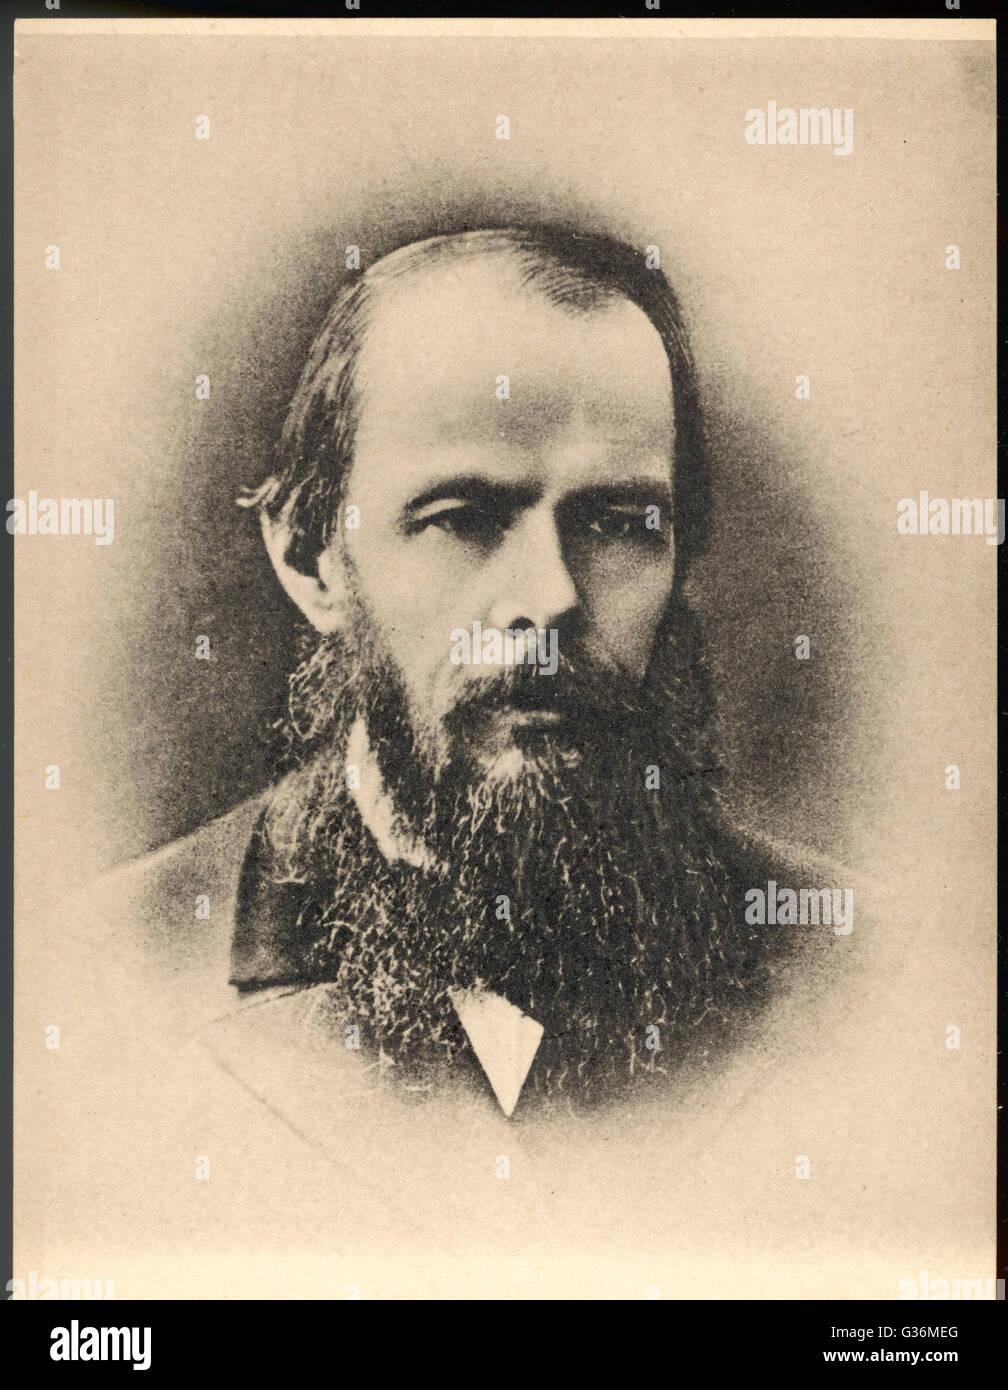 Feodor Dostoyevsky (1821-1881) Russian writer - Stock Image